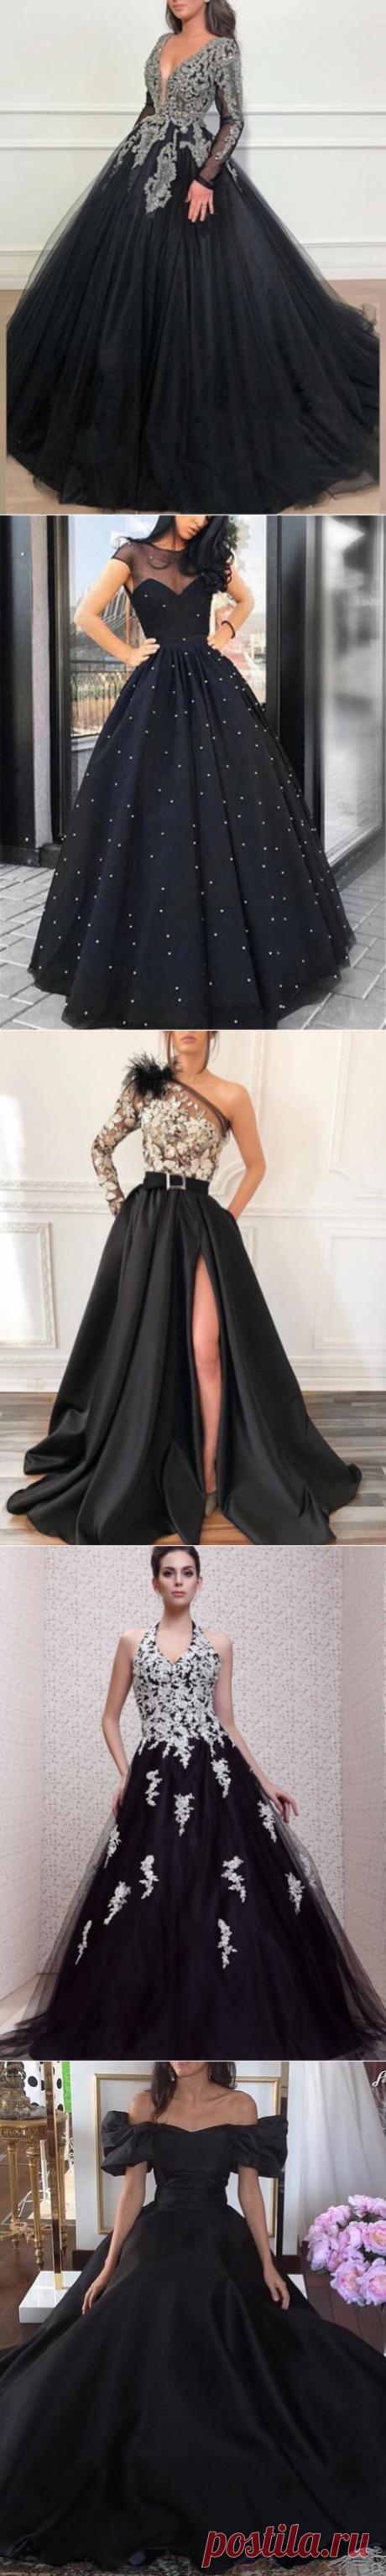 Cheap Special Occasion Dresses for Girls & Women Online - Tbdress.com